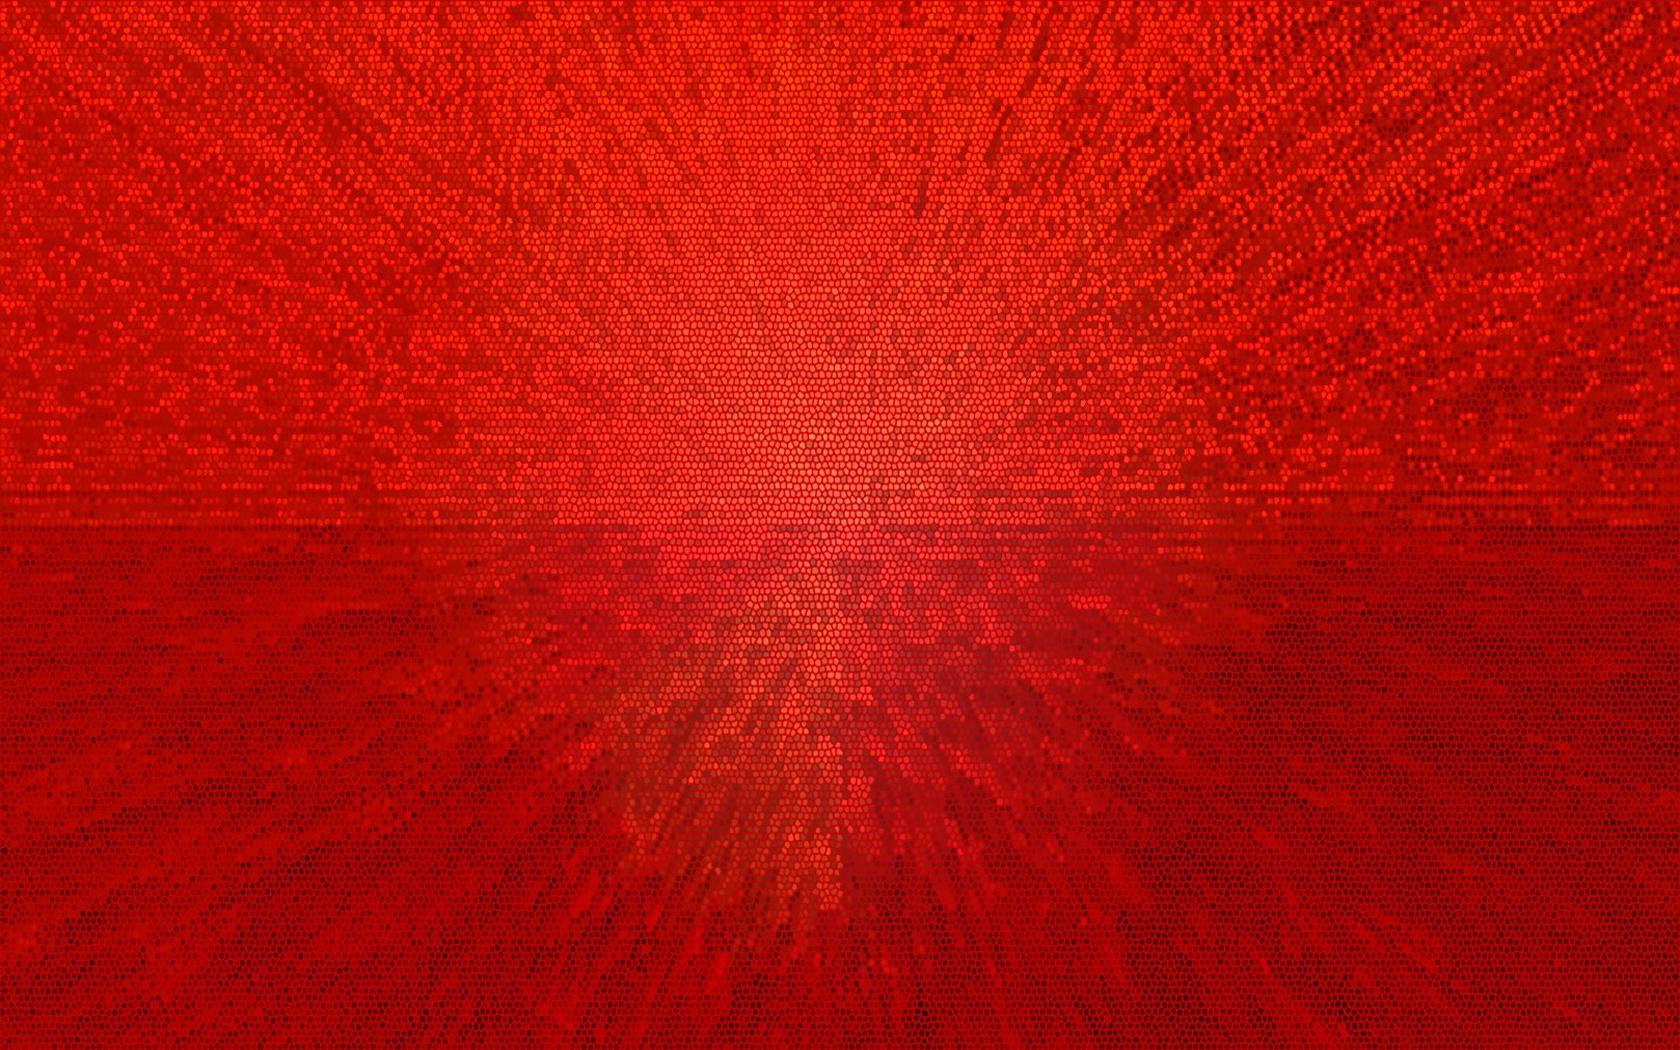 1680x1050 Red Energy desktop PC and Mac wallpaper